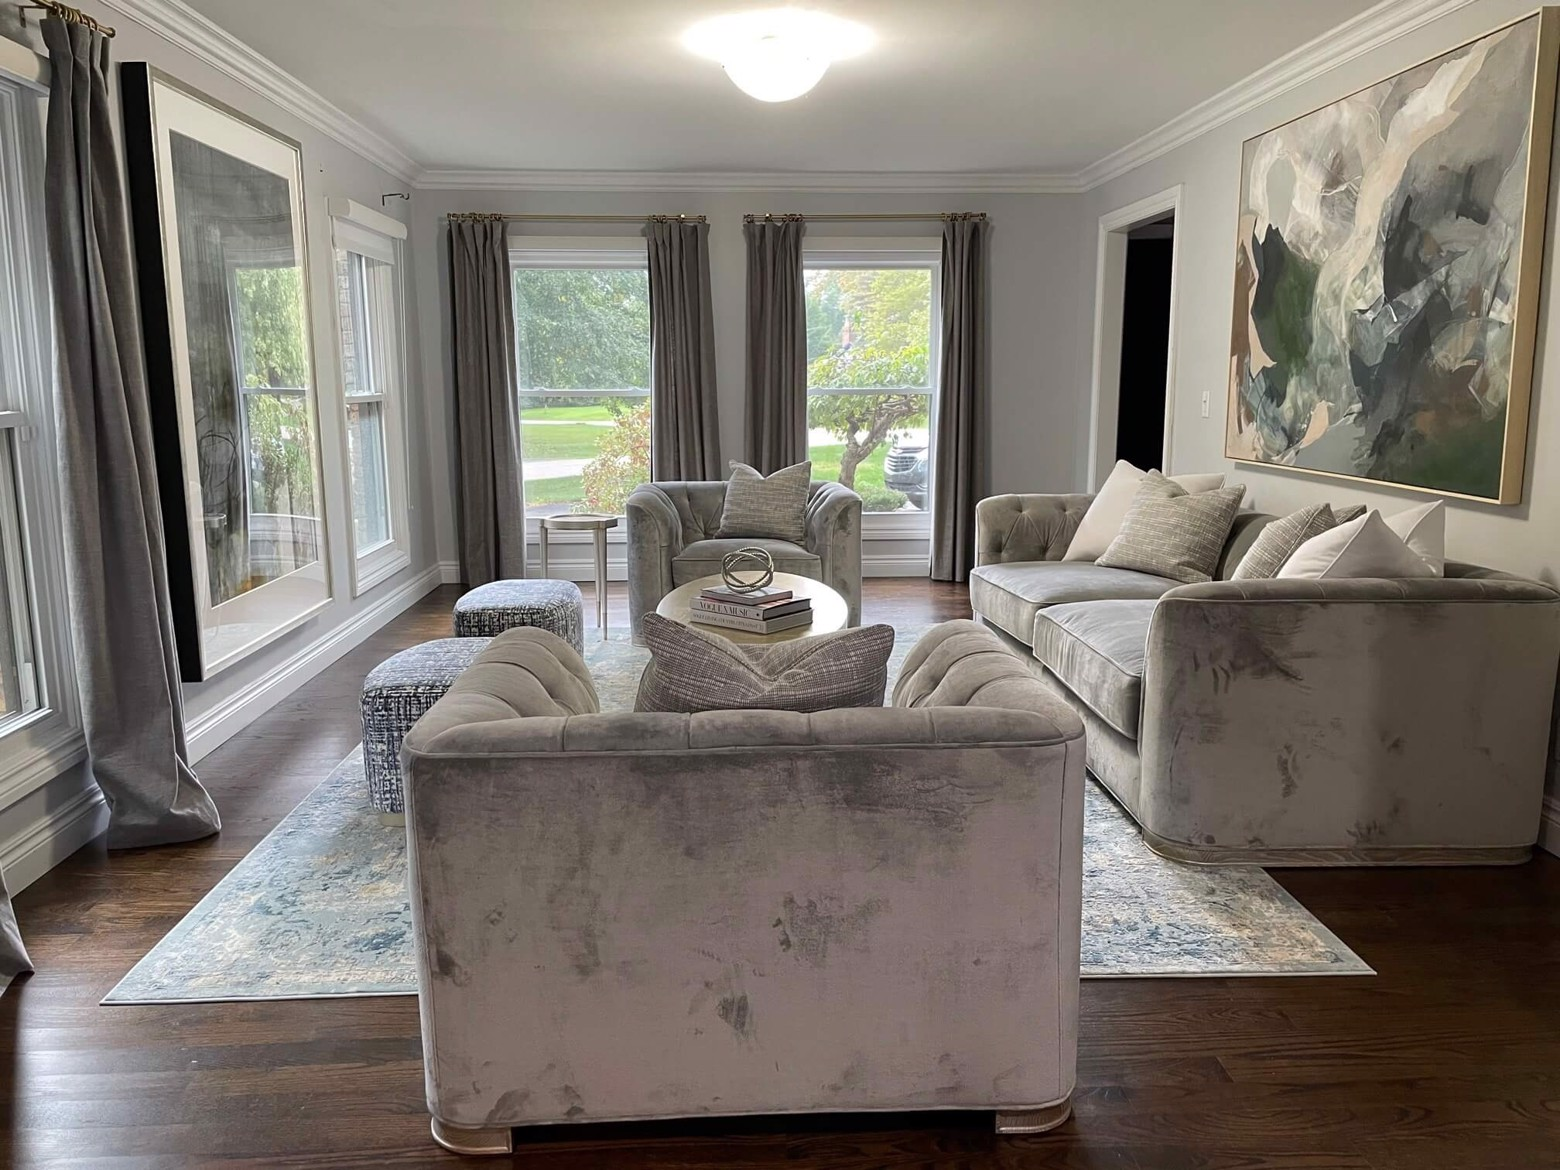 costanza-ellertsson-living-room-1.jpg image